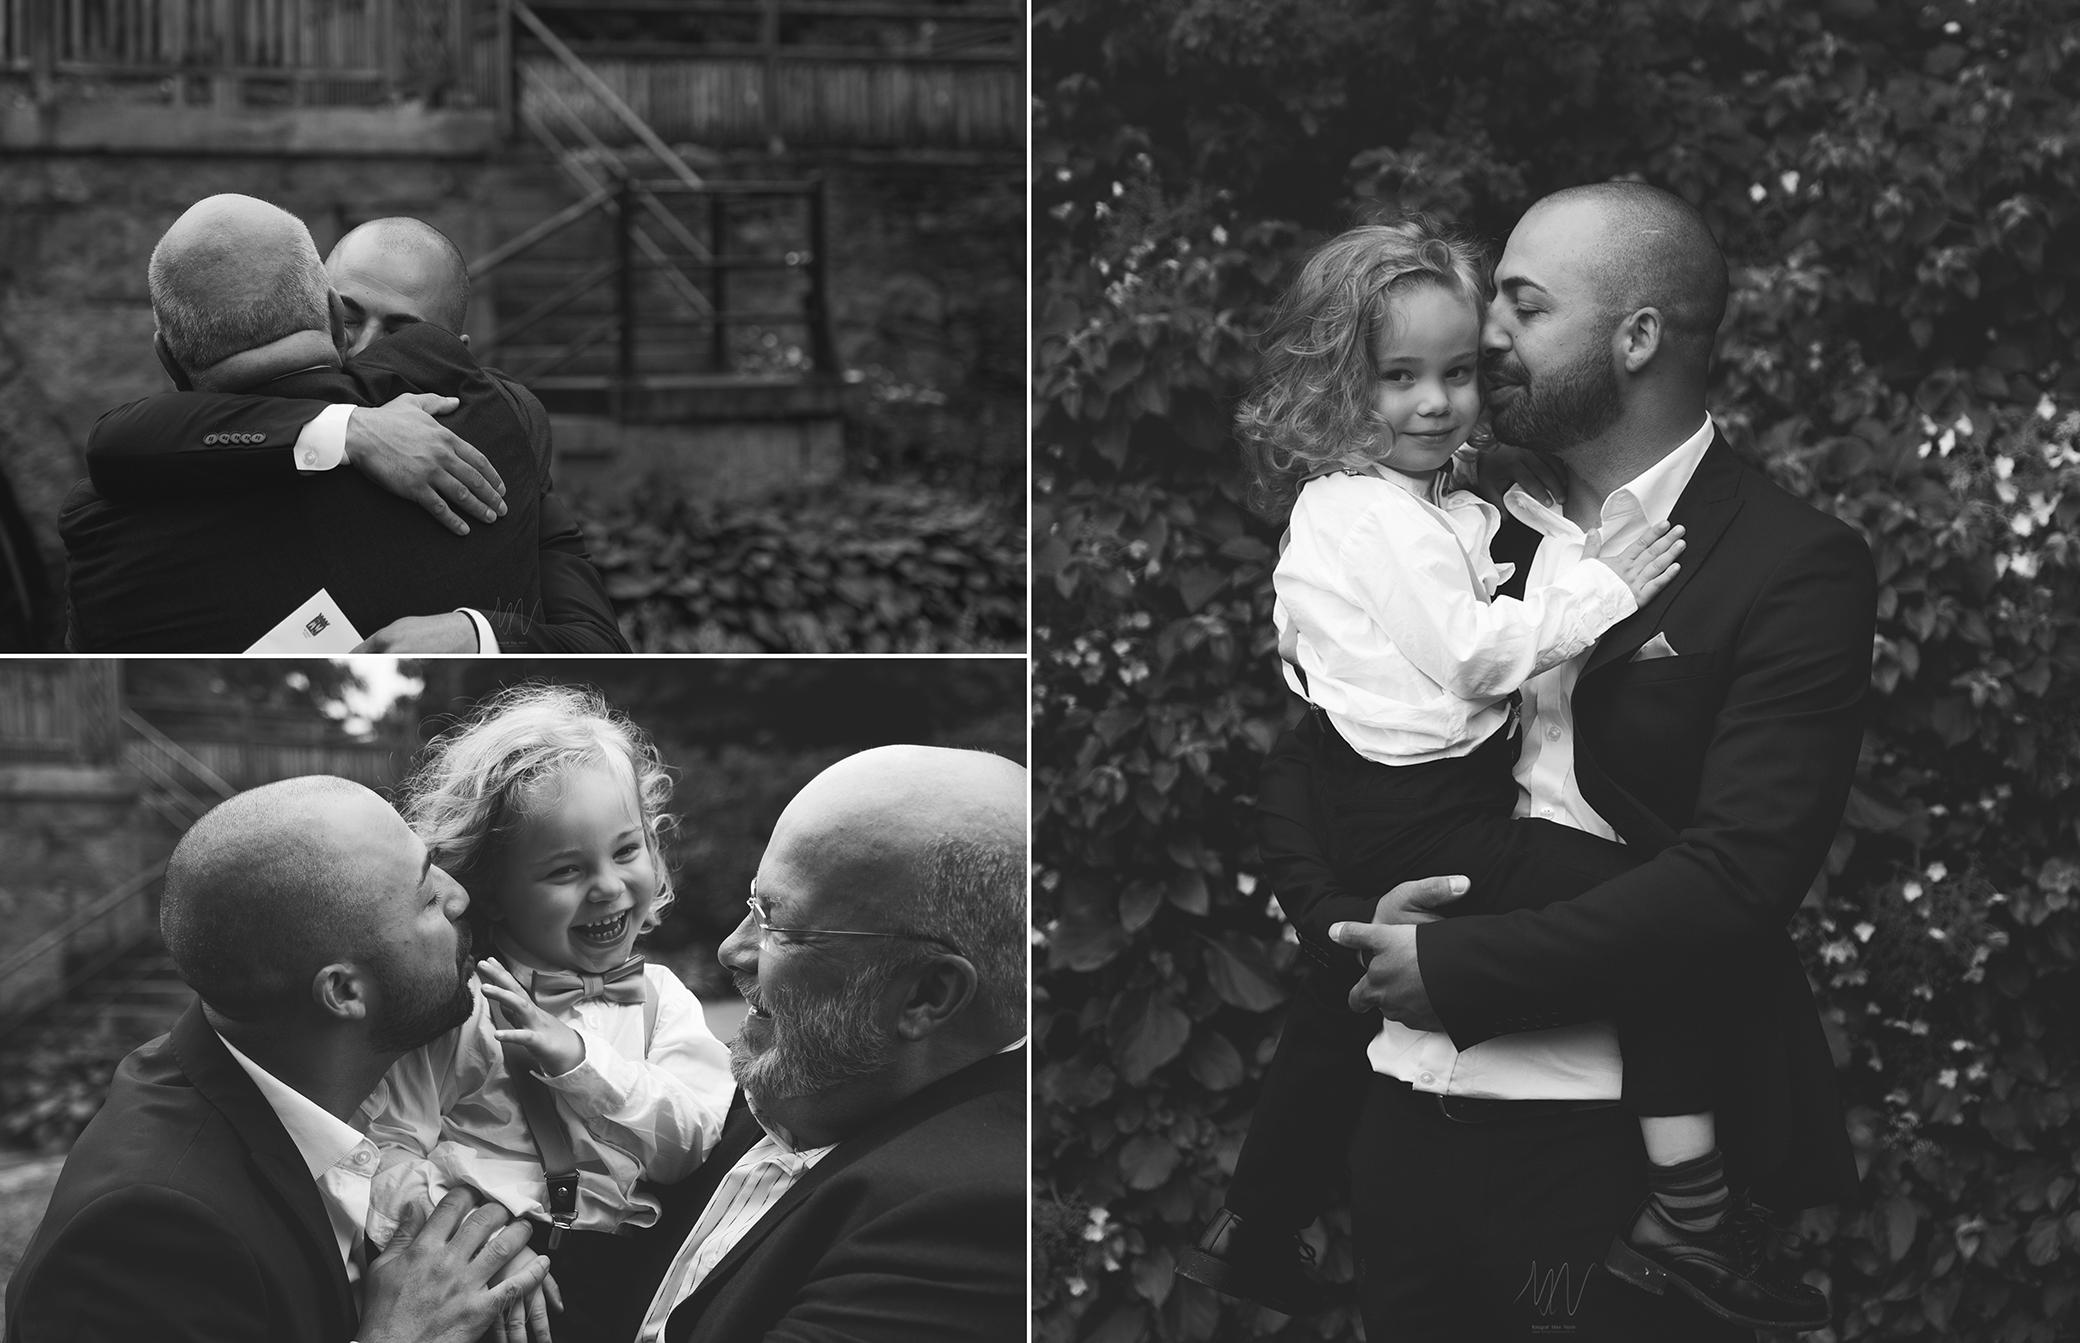 bröllopsfoto_maxnorin_borås-9 kopiera.jpg